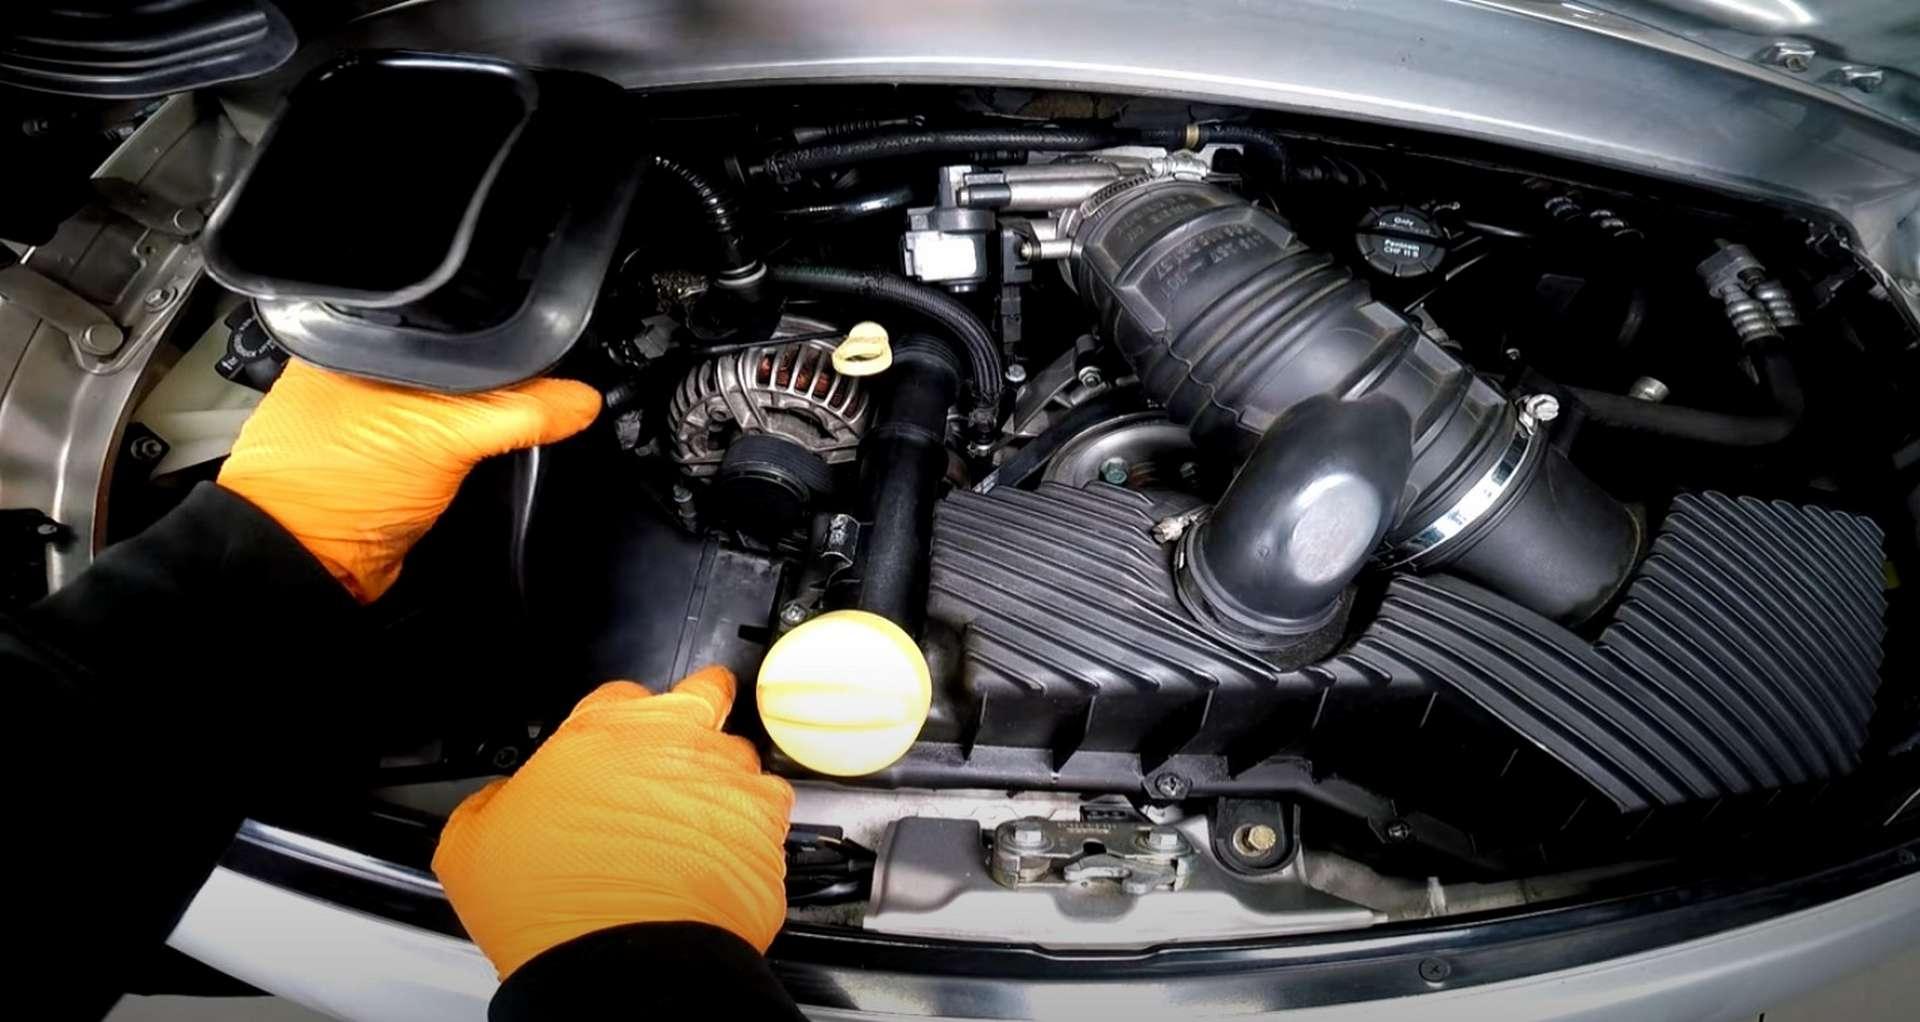 08-DIY-Porsche-996-Accessory-Belt-Replacement_Refitting_Intake